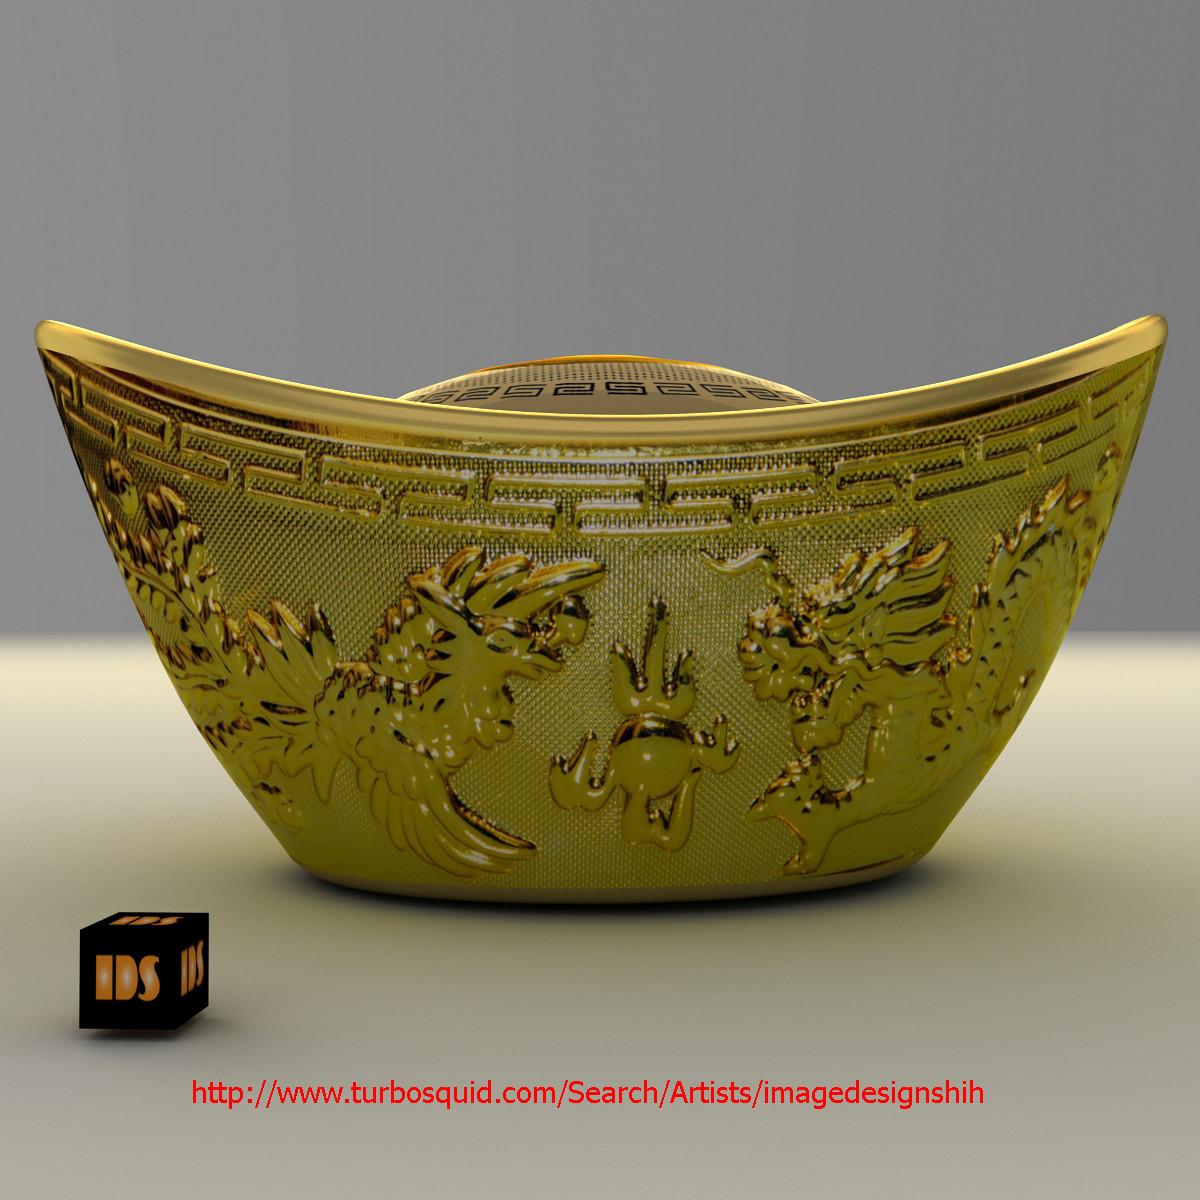 yuanbao_patternH_logo.jpg